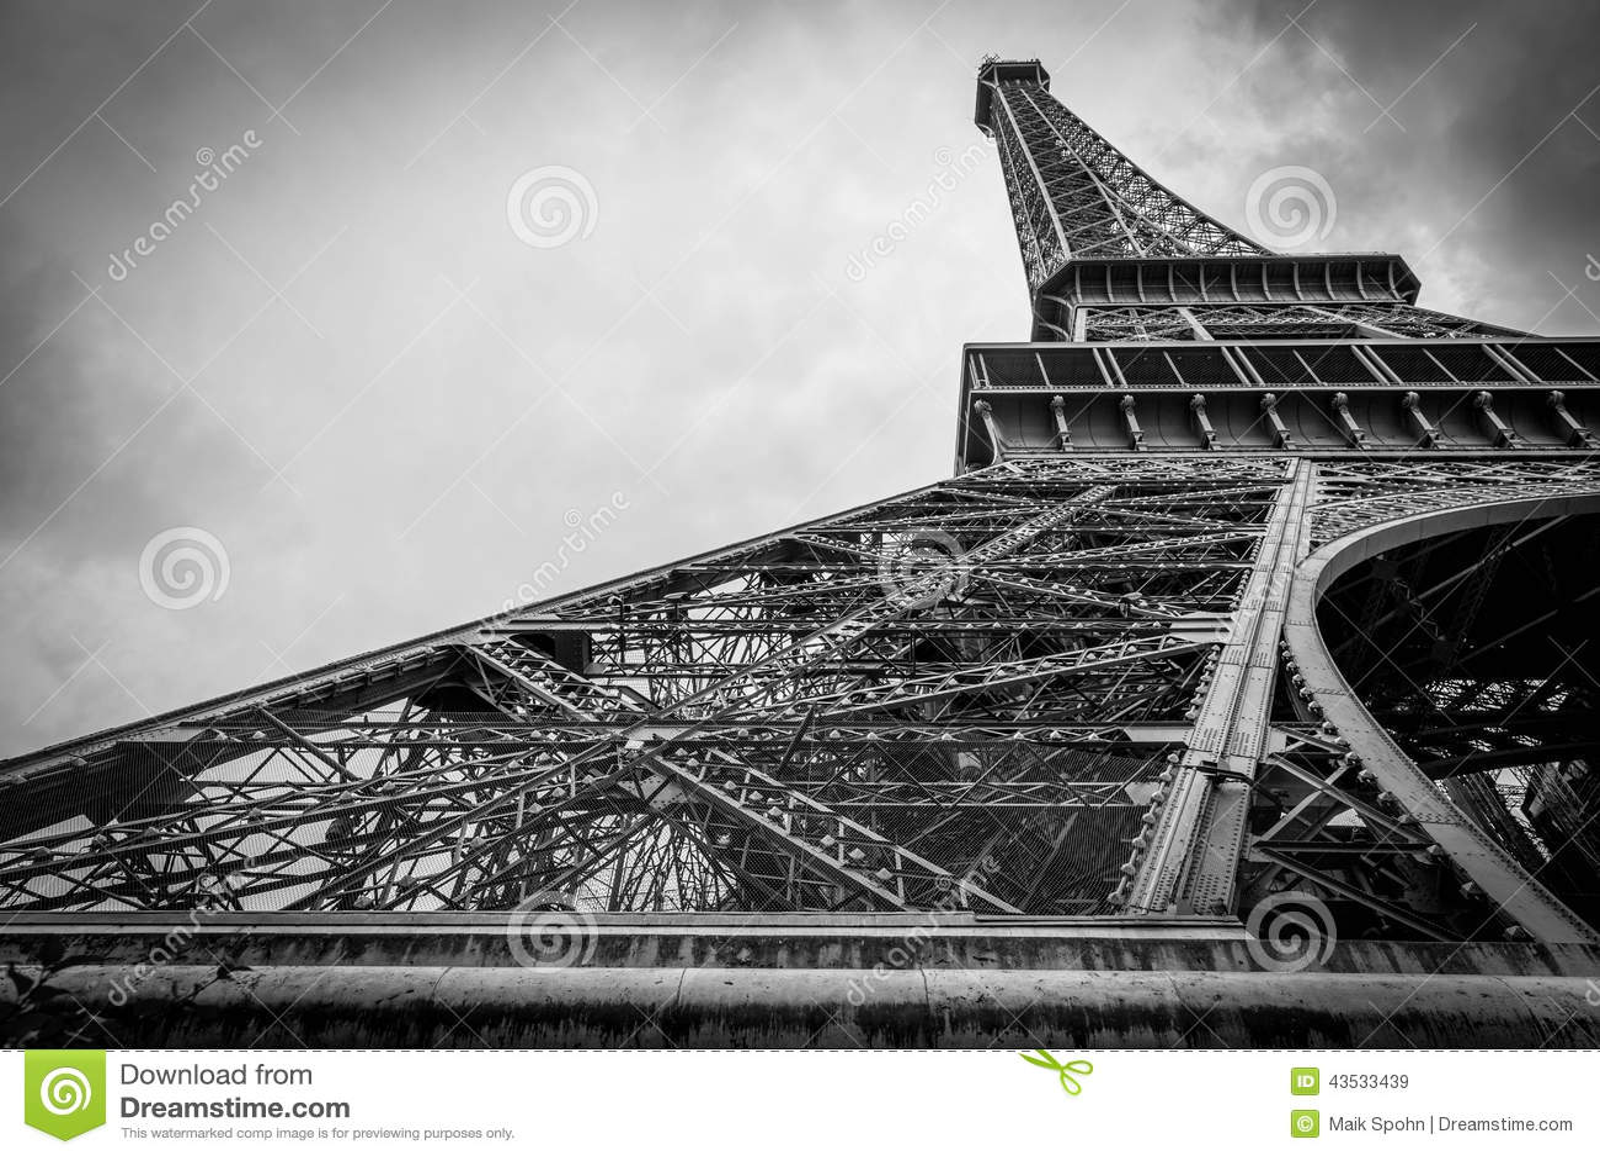 Eiffel Tower in Paris II